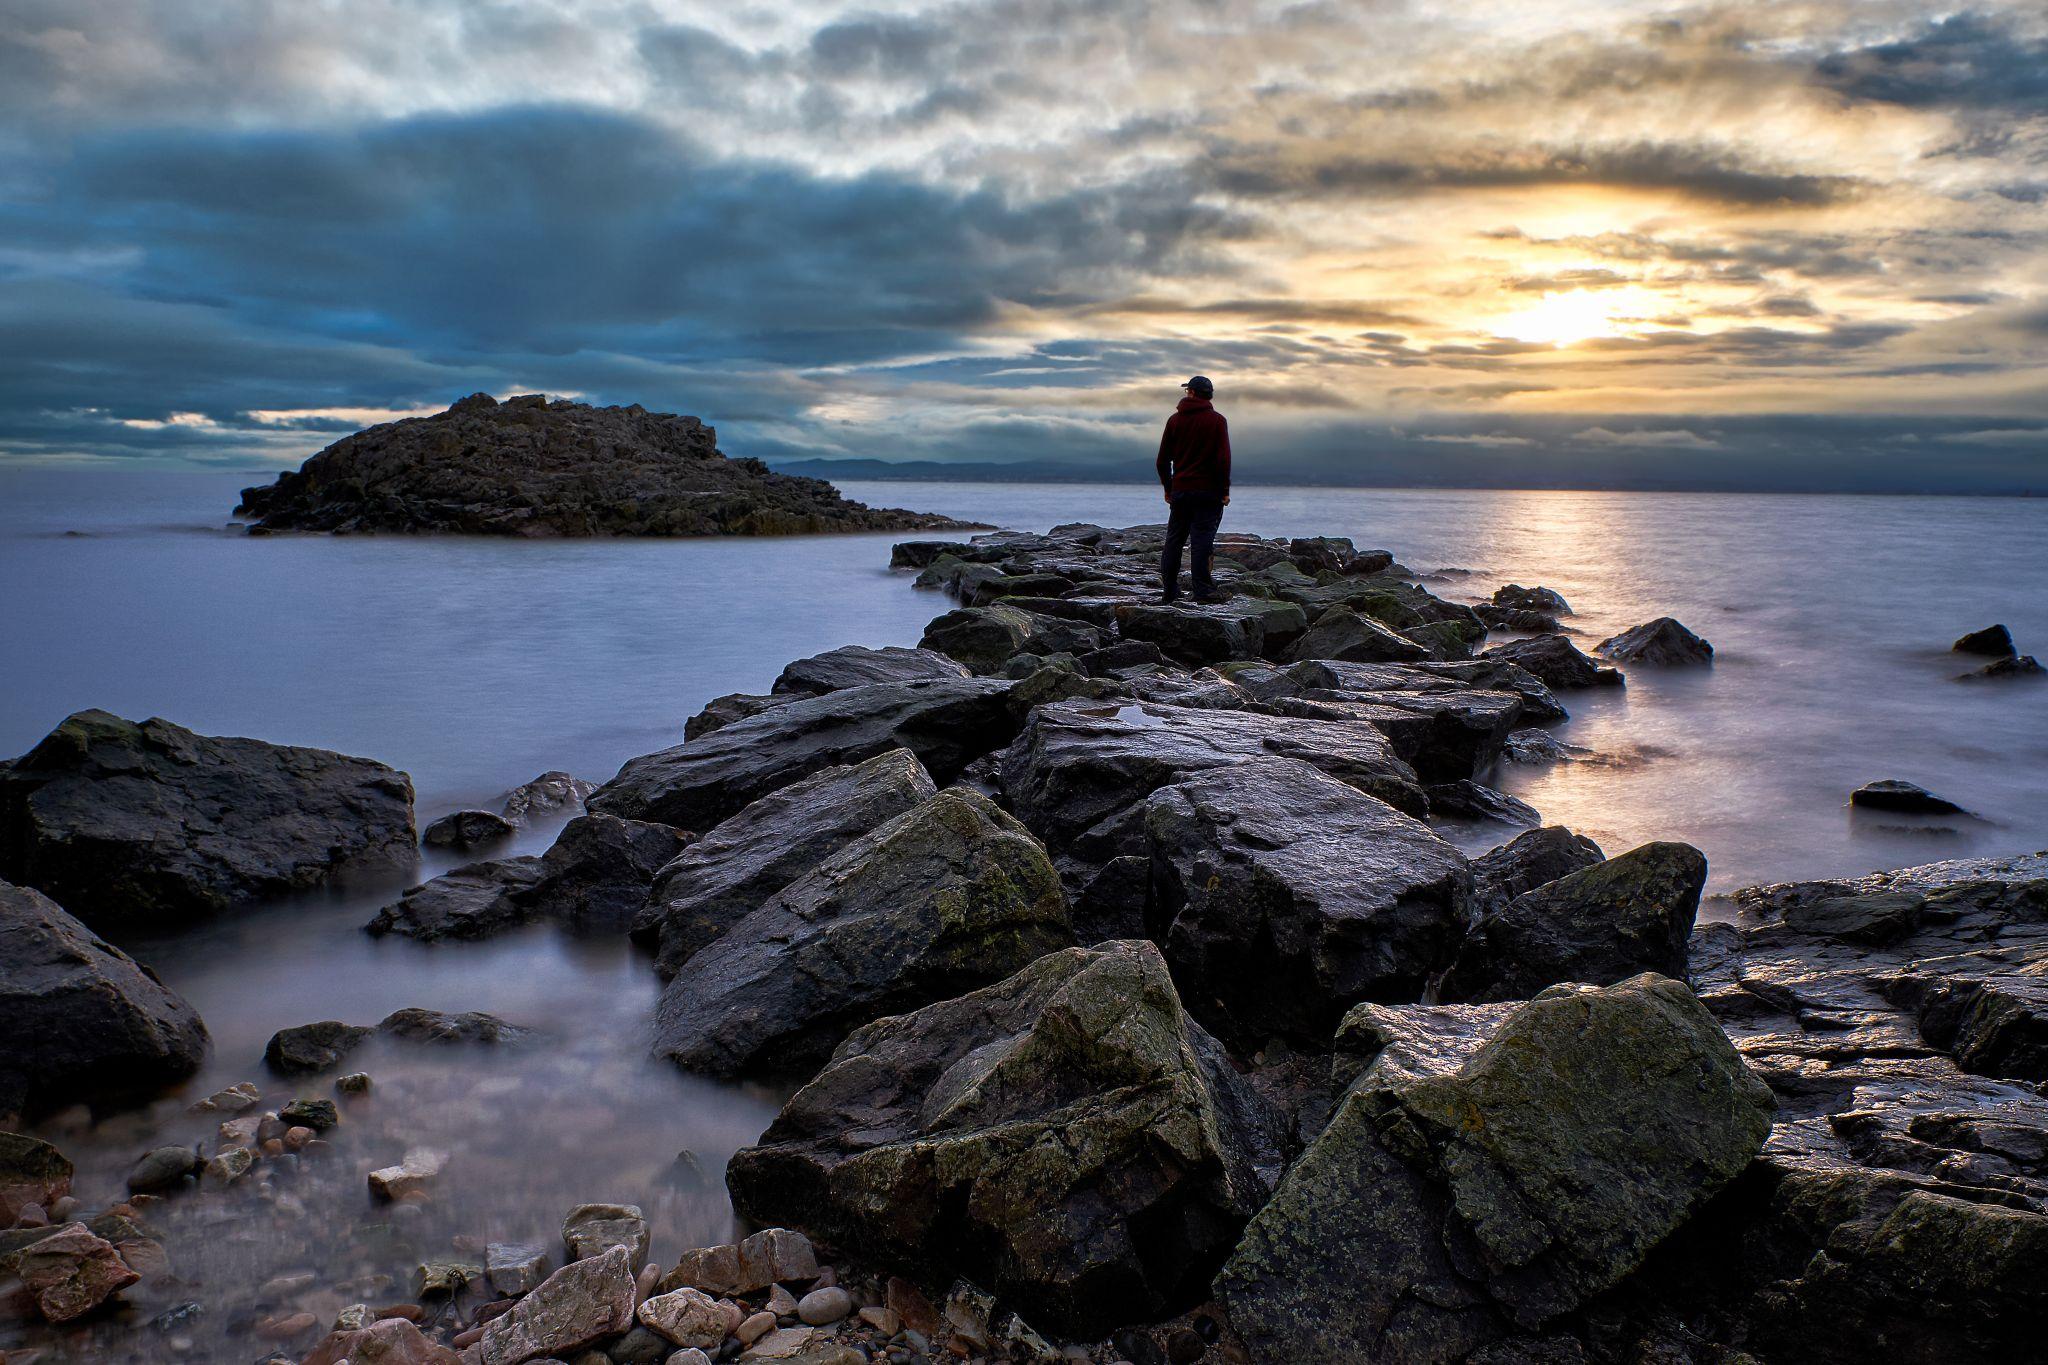 Secret beach, Howth head, Ireland